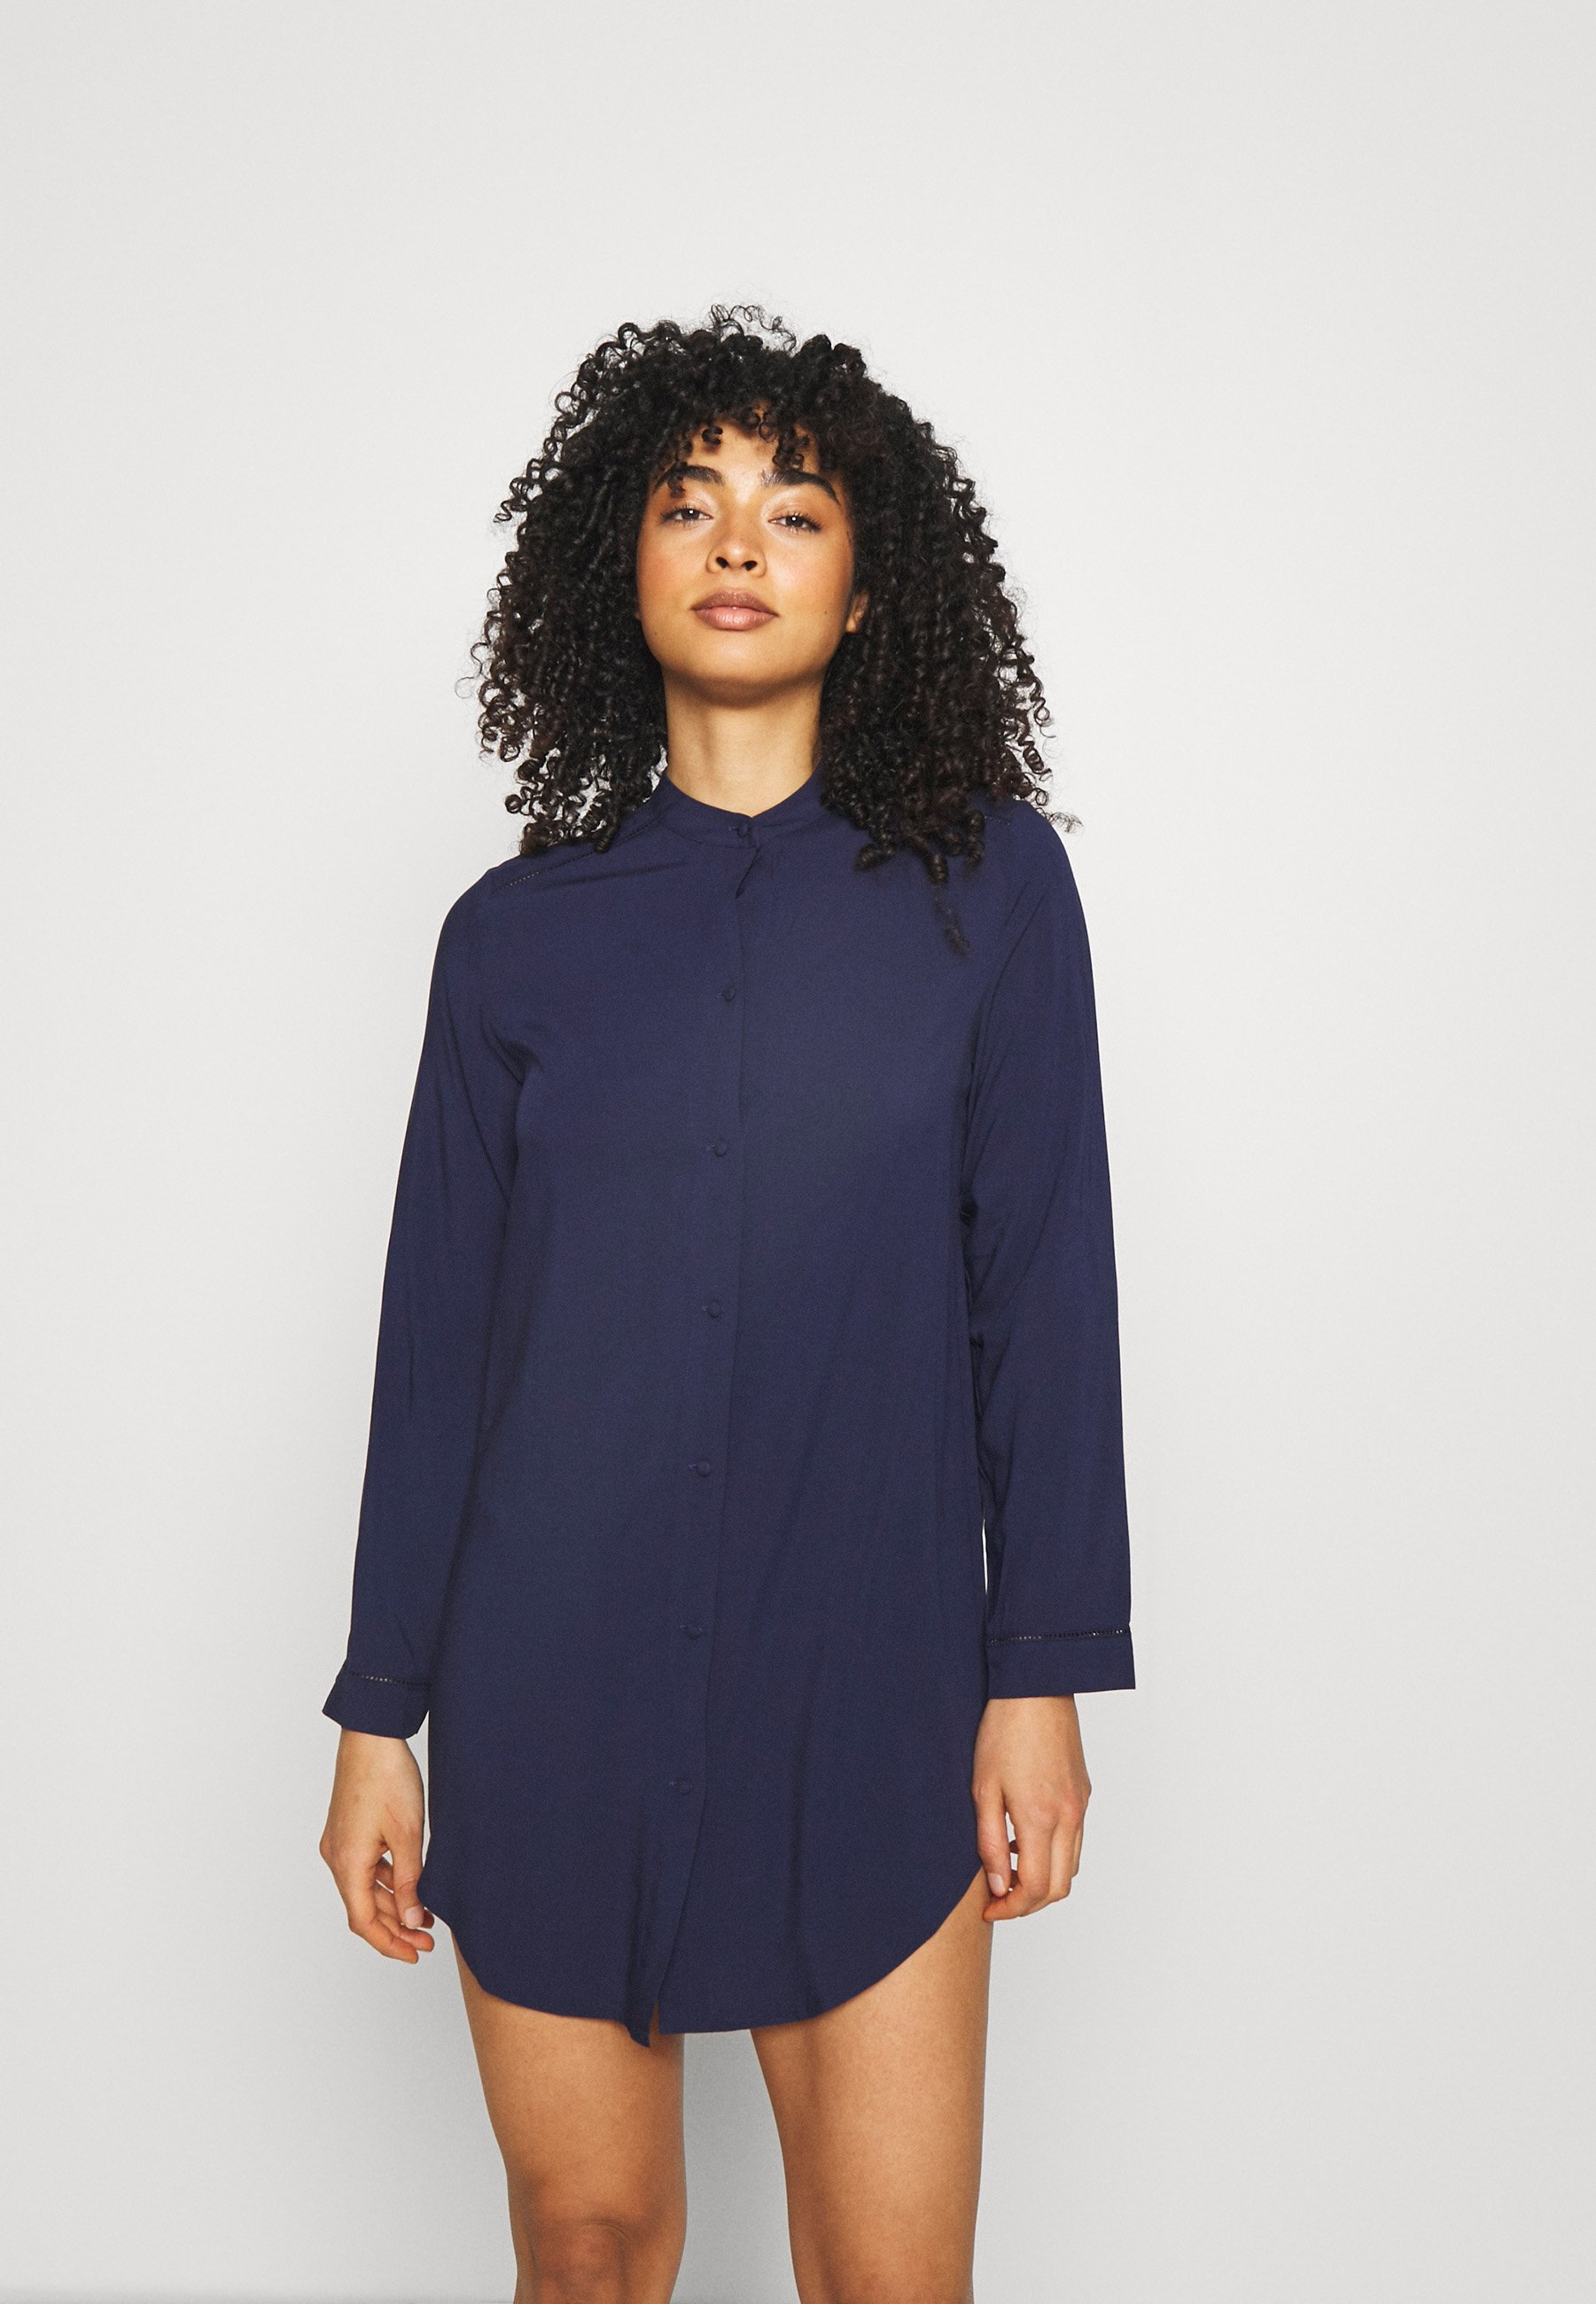 Damen SONGE NÉGLIGÉ - Nachthemd